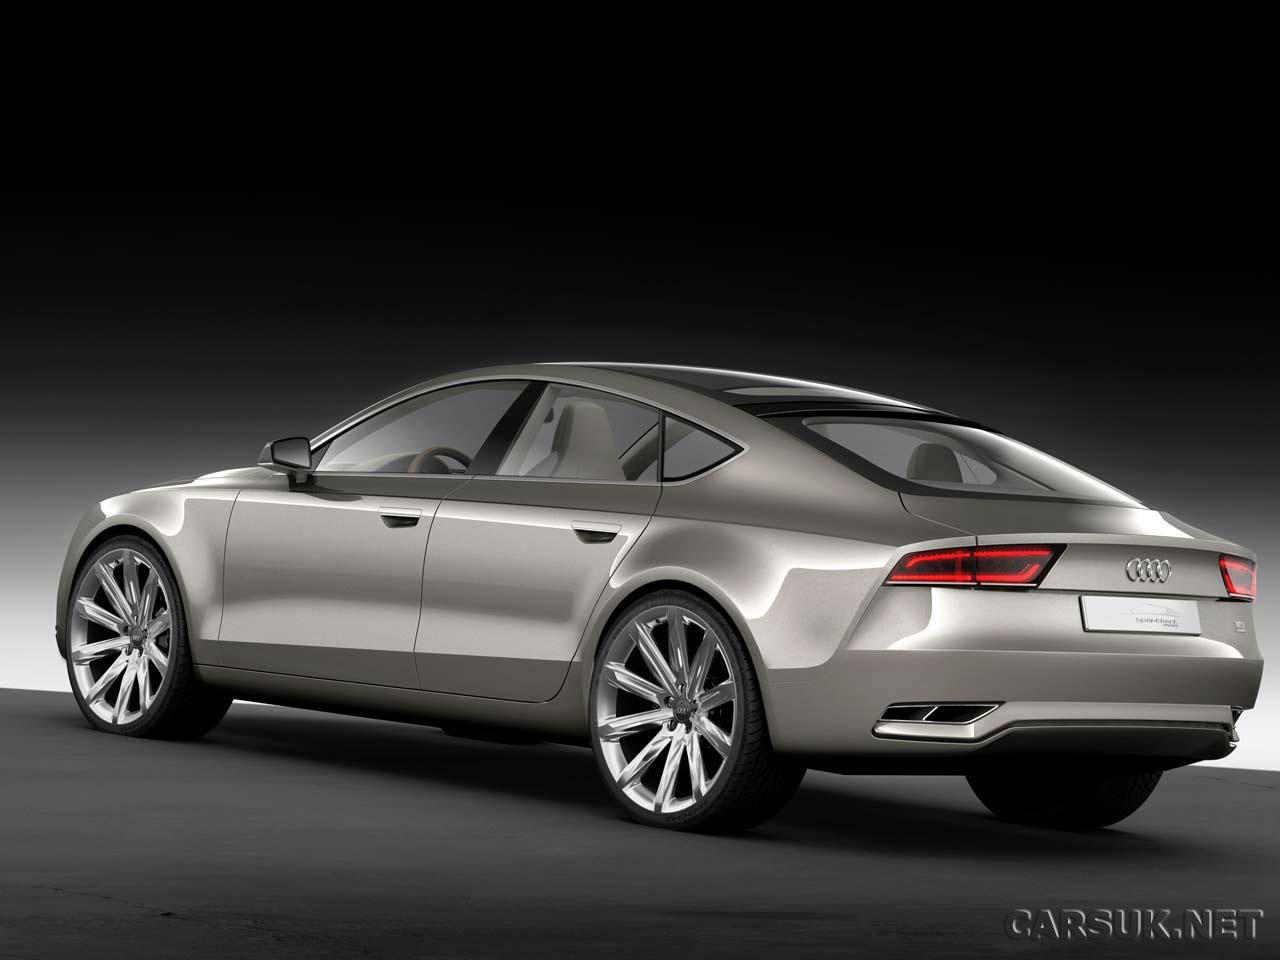 top 10 most beautiful cars of 2011 carwow blogspot com. Black Bedroom Furniture Sets. Home Design Ideas